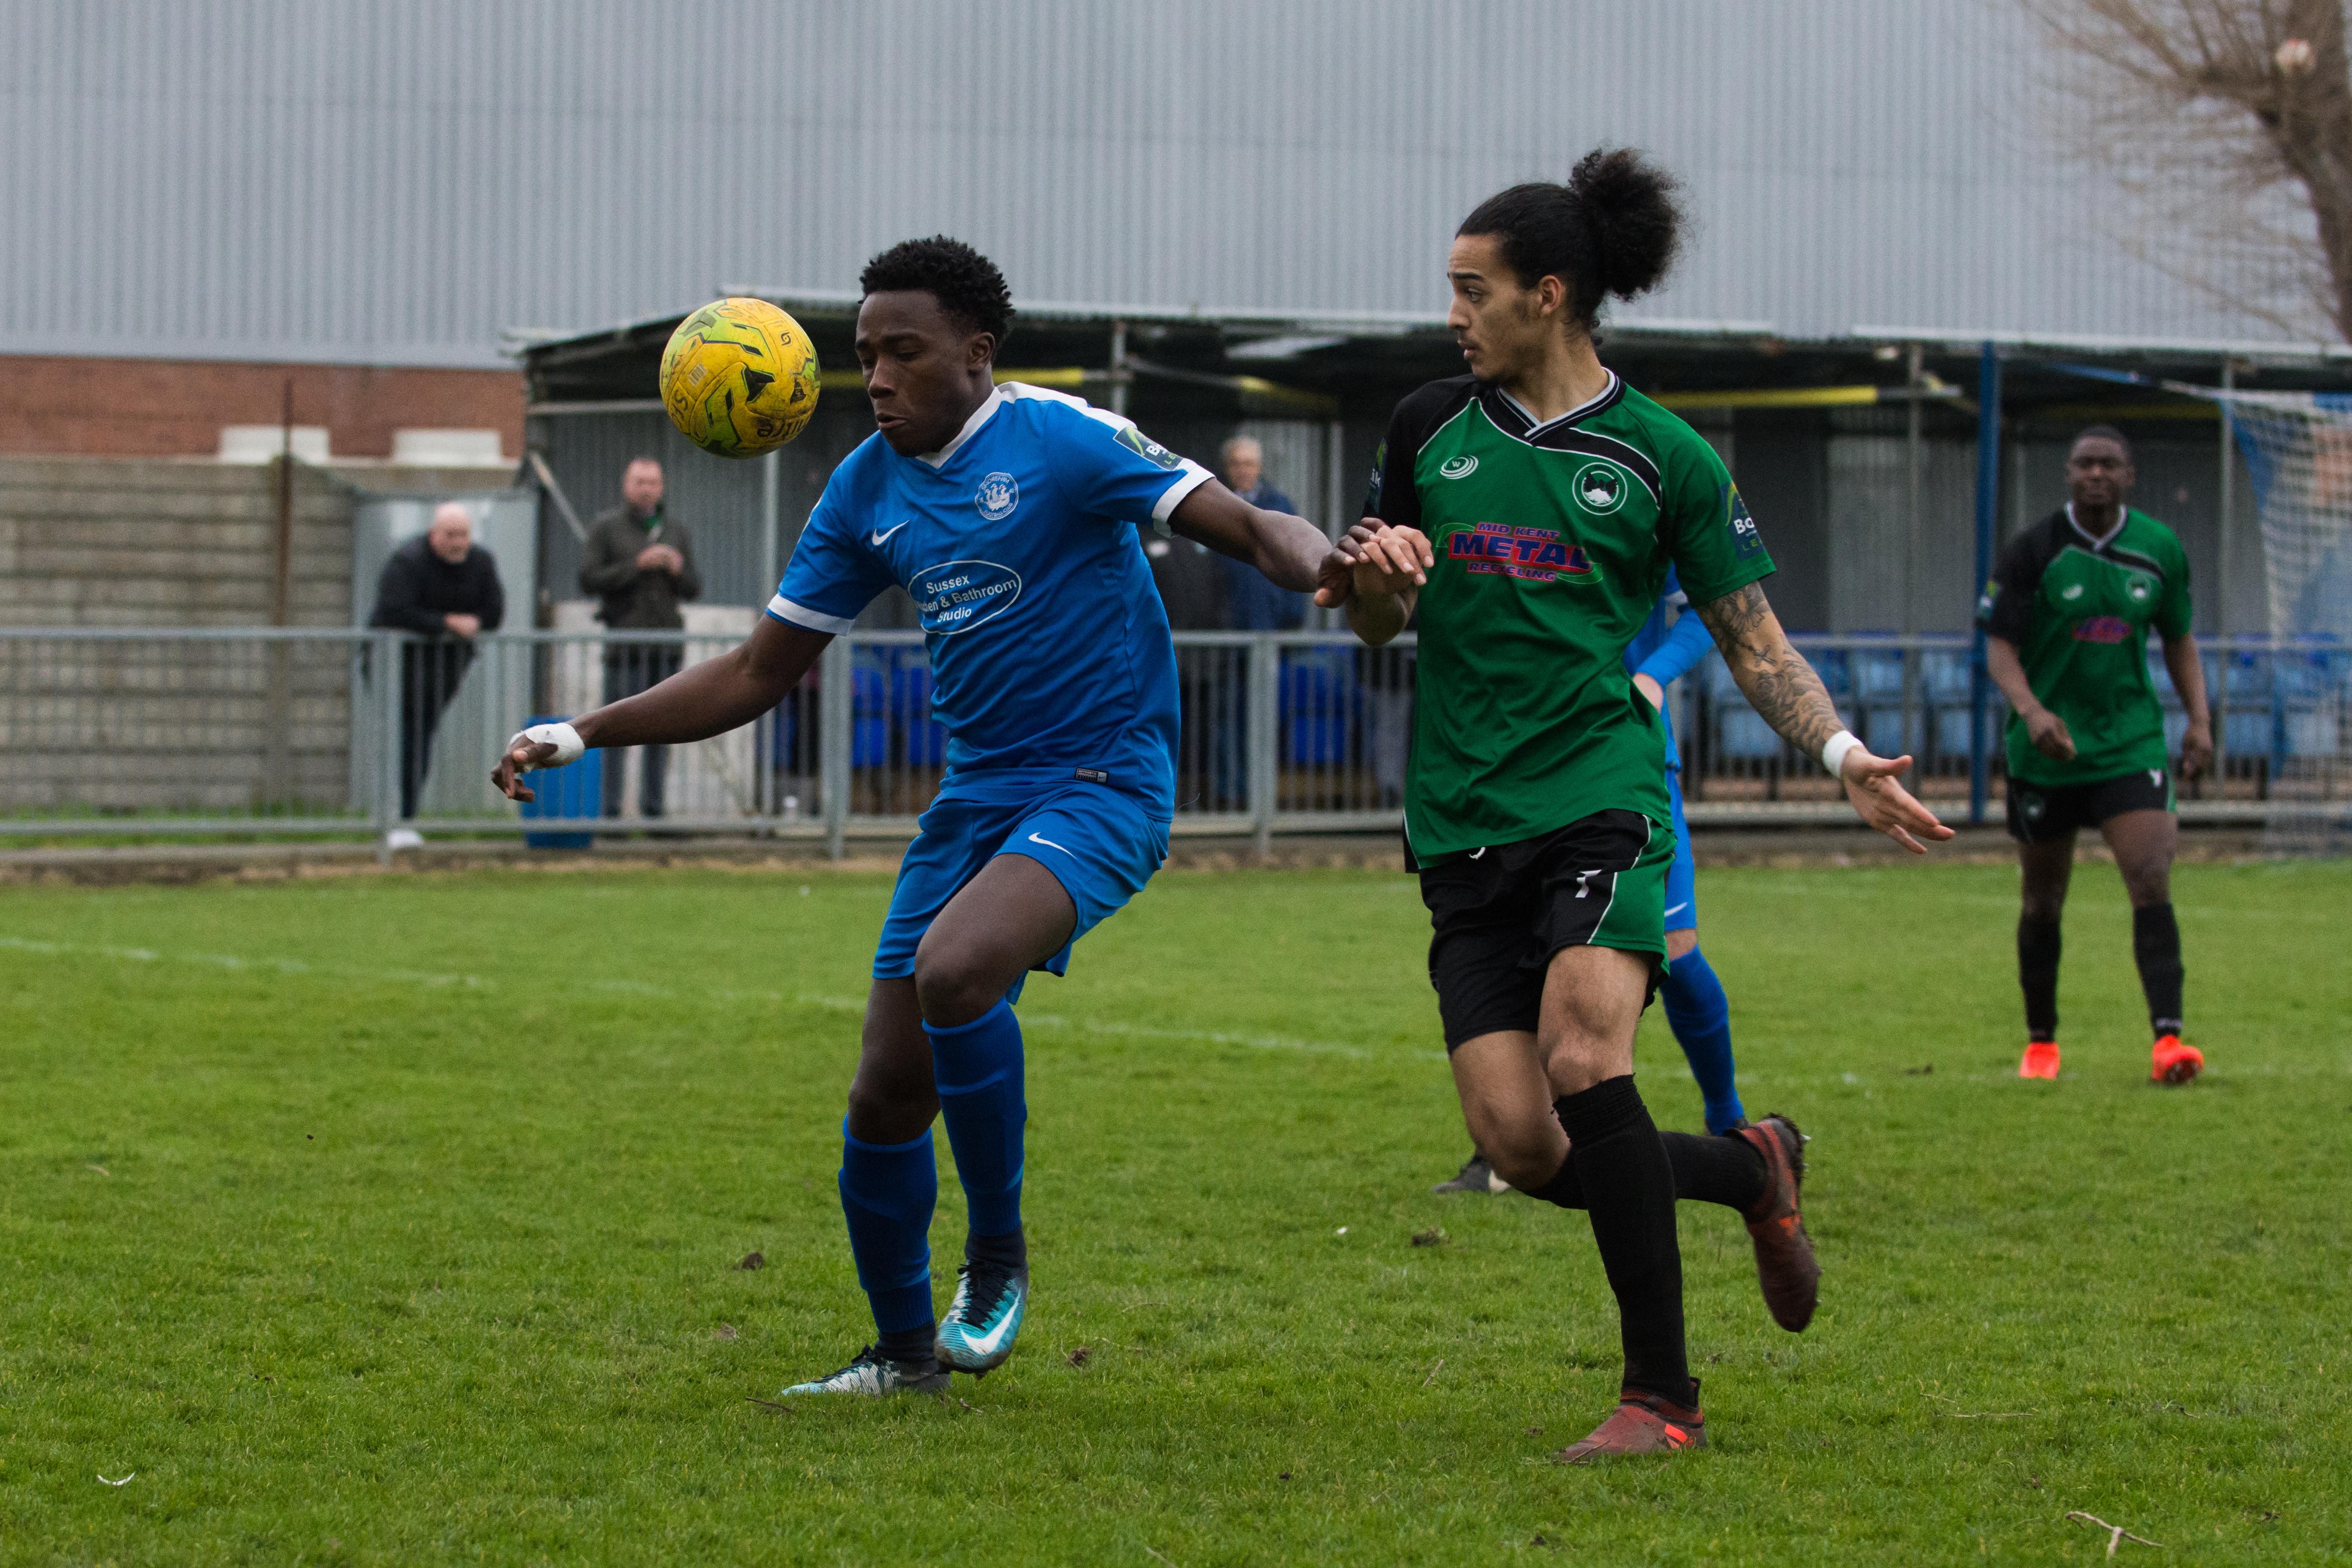 Shoreham FC vs Phoenix Sports 13.01.18 27